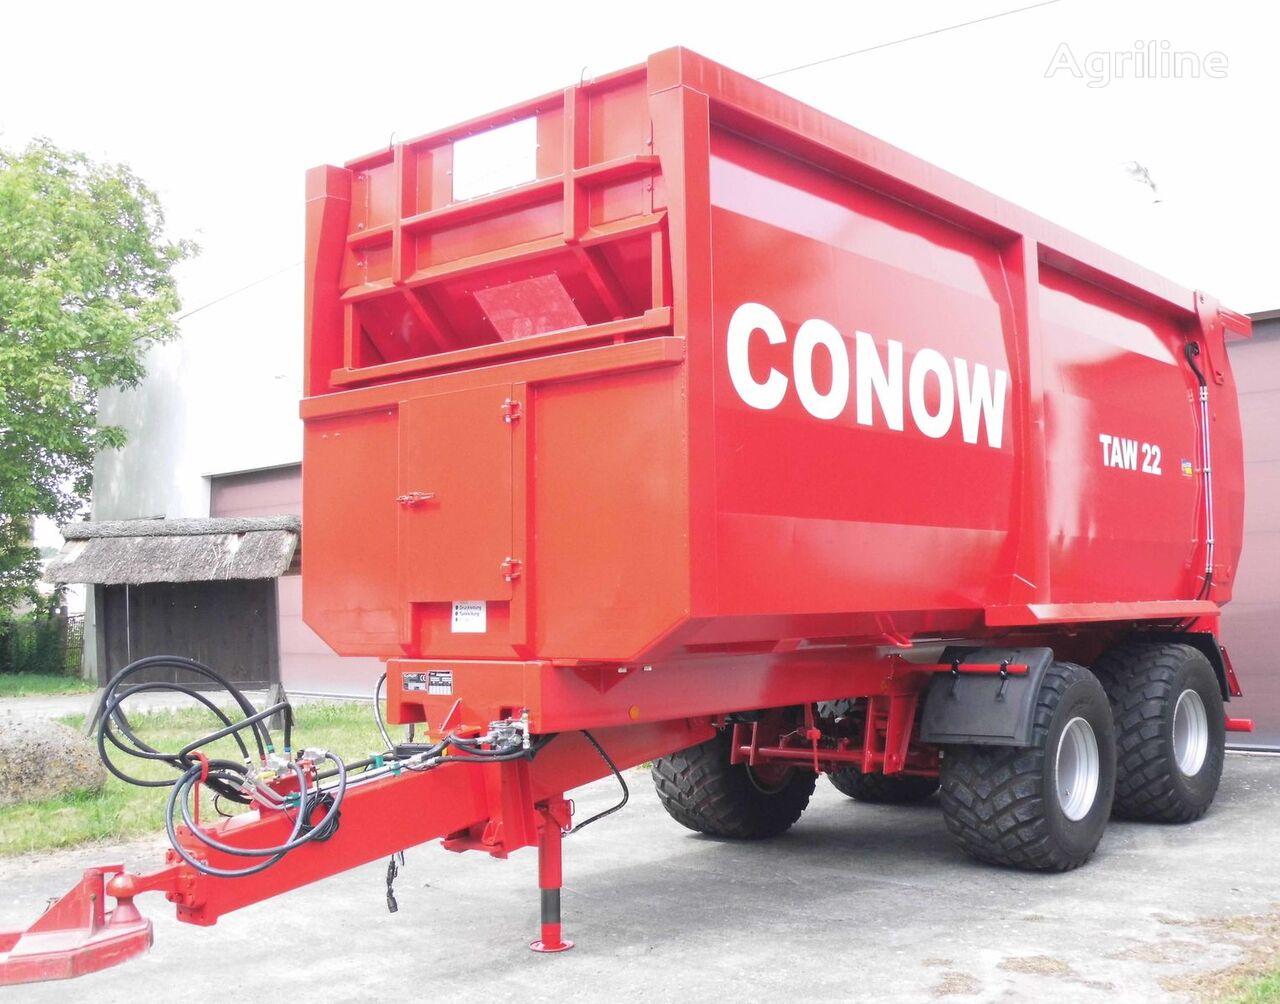 neuer CONOW TAW 22 Traktoranhänger